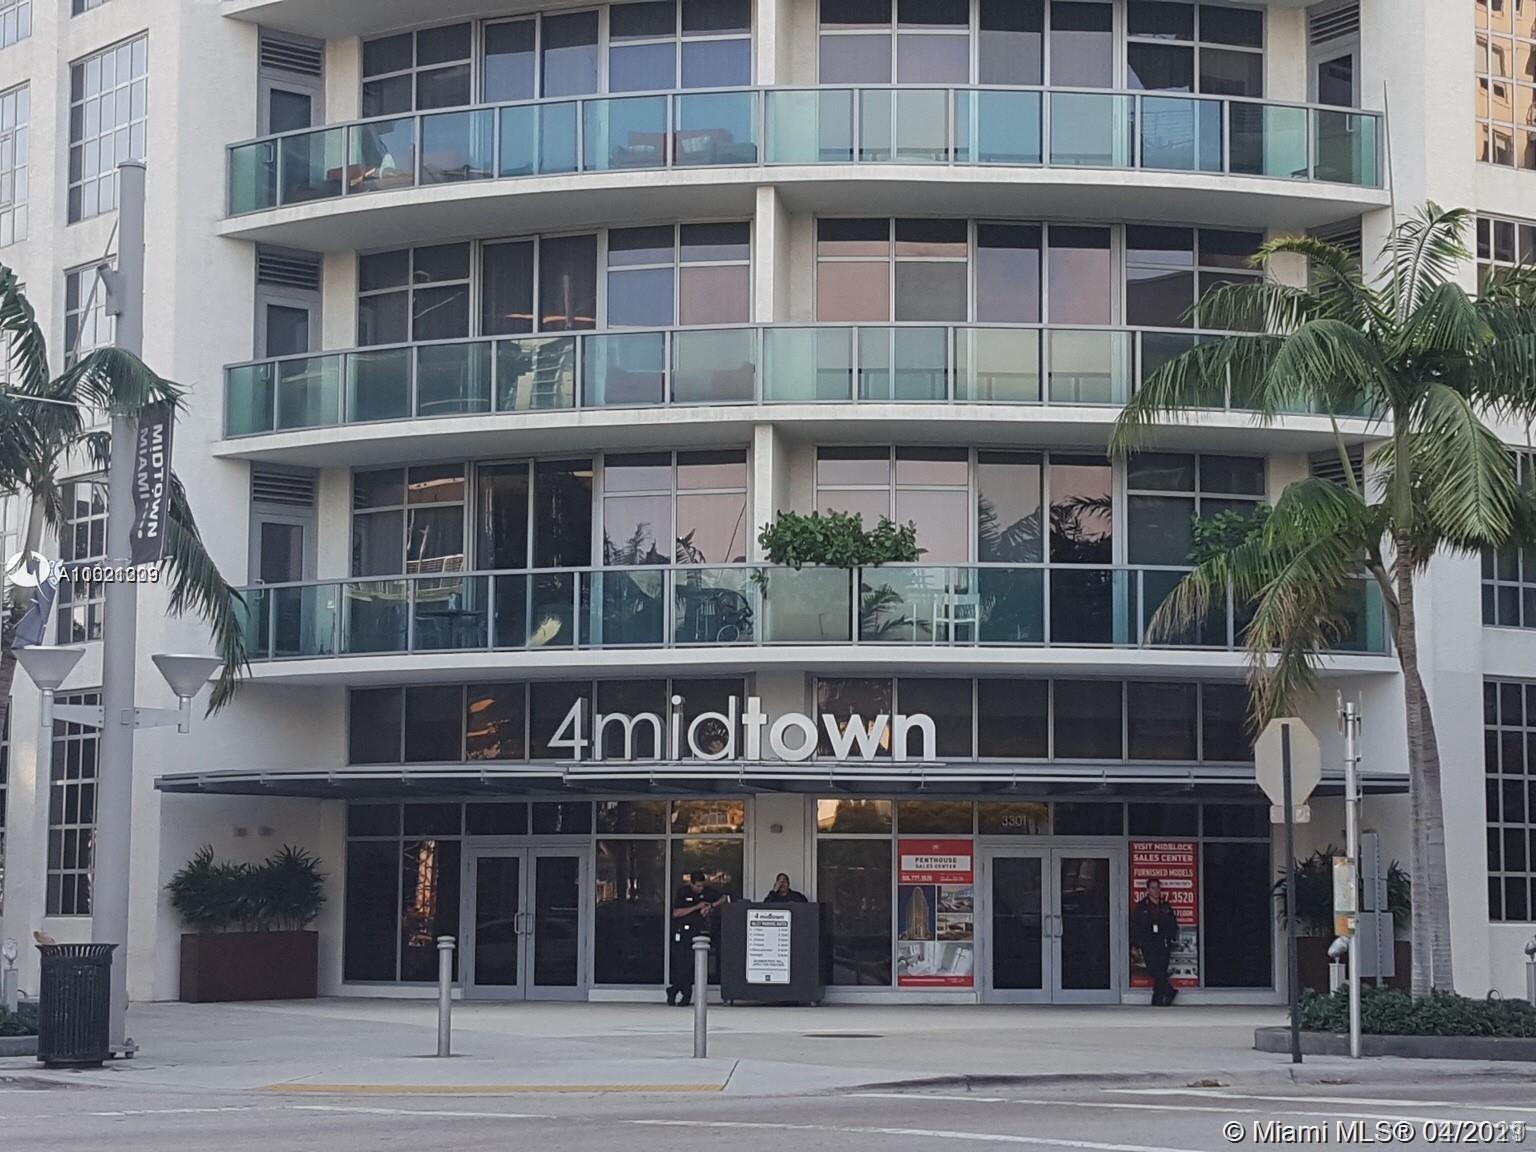 4 Midtown #L0201 - 3301 NE 1st Ave #L0201, Miami, FL 33137